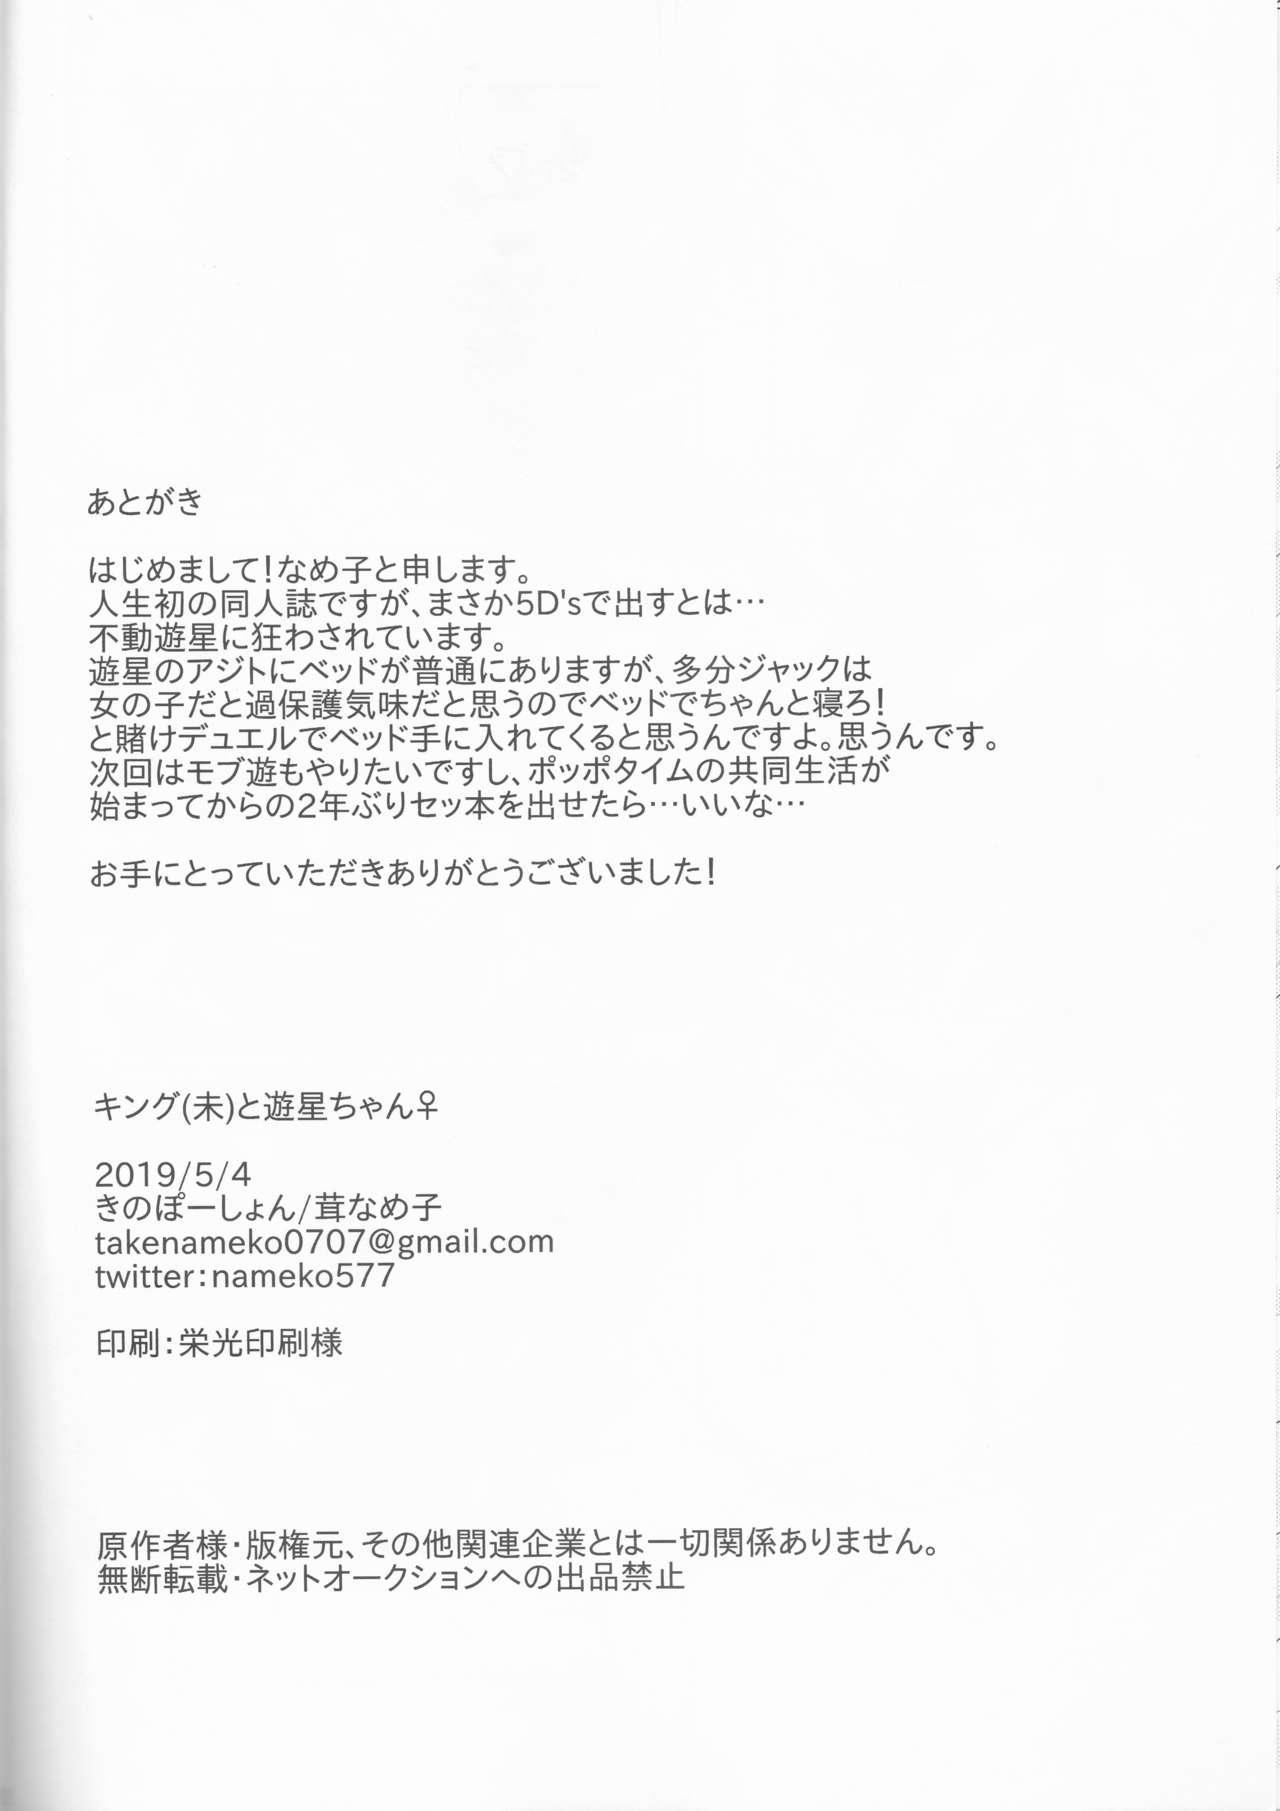 (Chou Ore no Turn 2019) [KINOPOTION (Take Nameko)] King (Mi) to Yusei-chan ♀ (Yu-Gi-Oh! 5D's) 21